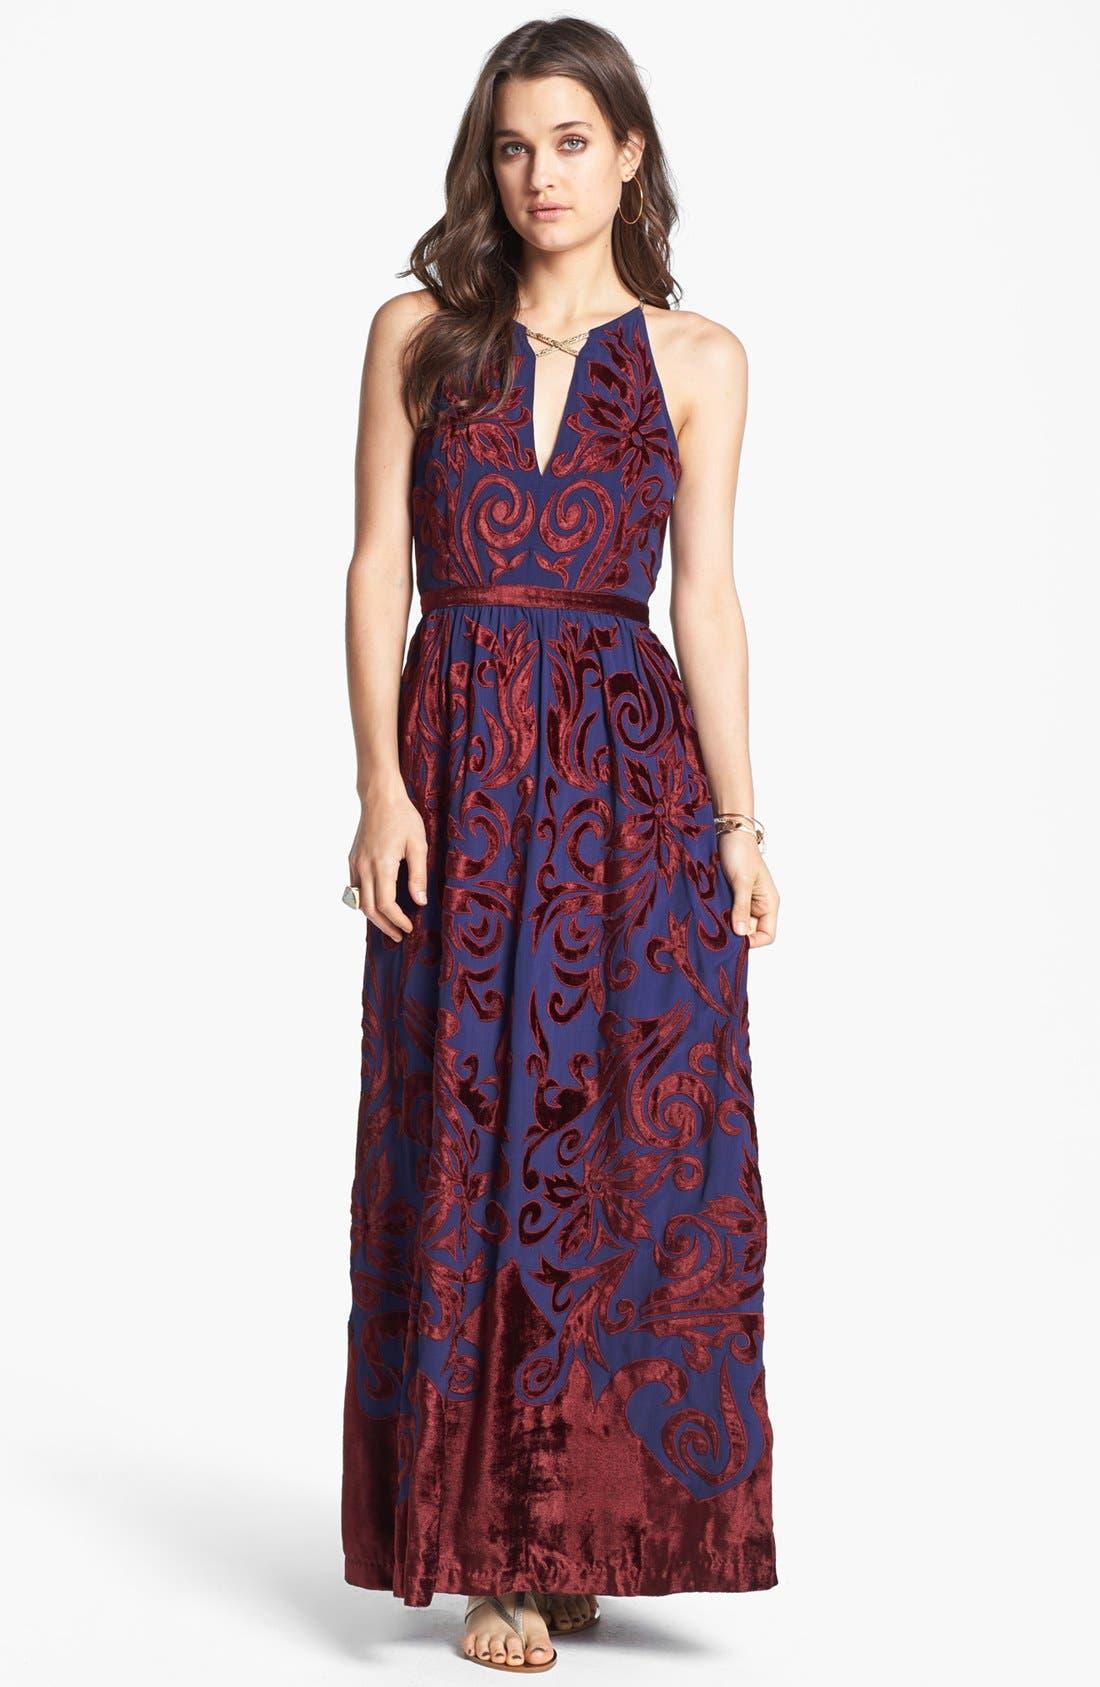 Alternate Image 1 Selected - Free People 'Hedge Maze' Velvet Appliqué Maxi Dress